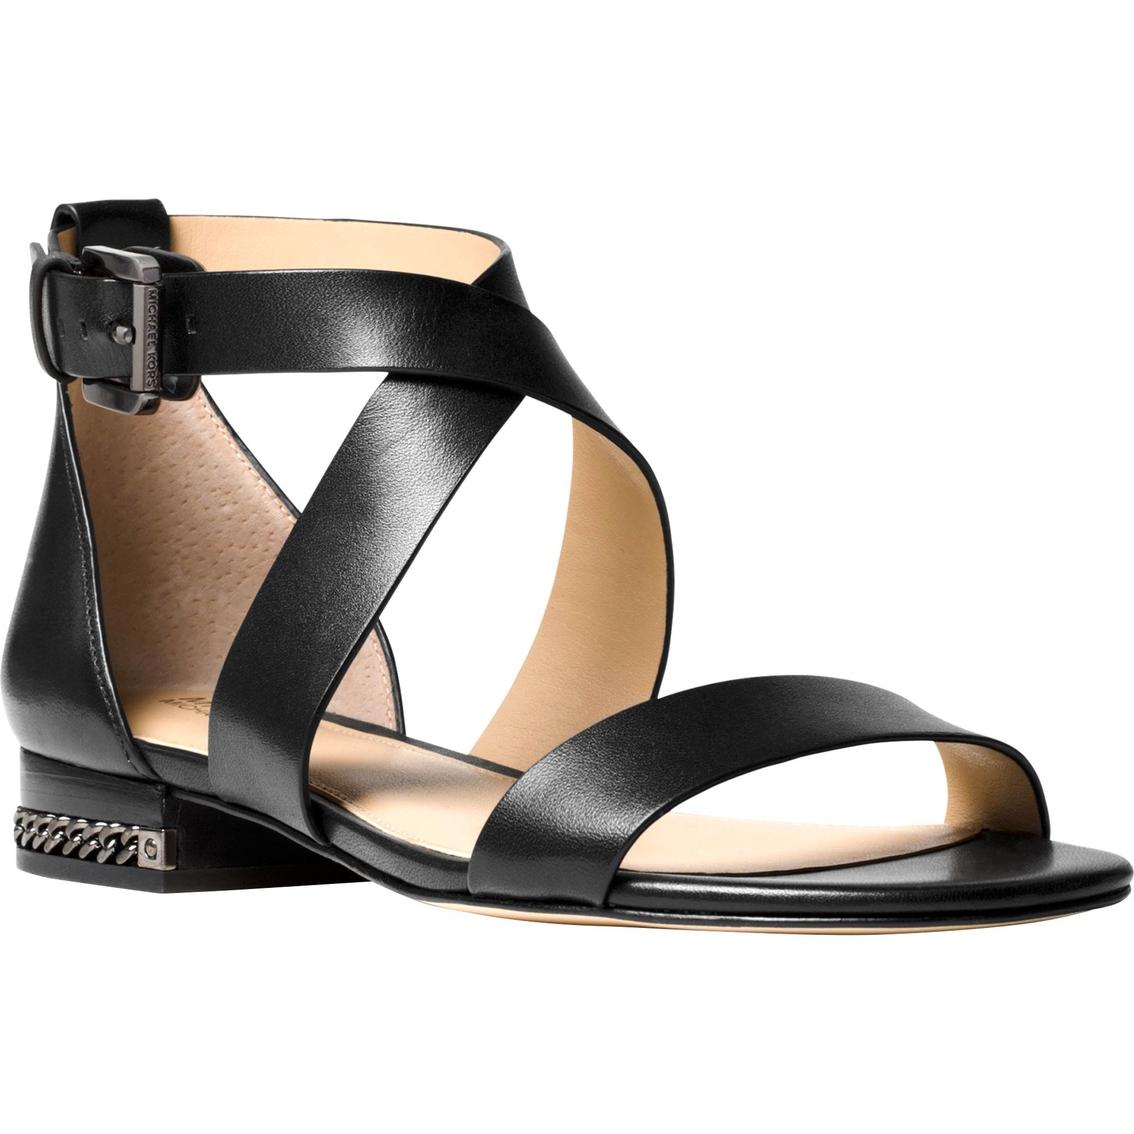 Michael Kors Sabrina Sandals | Shoes